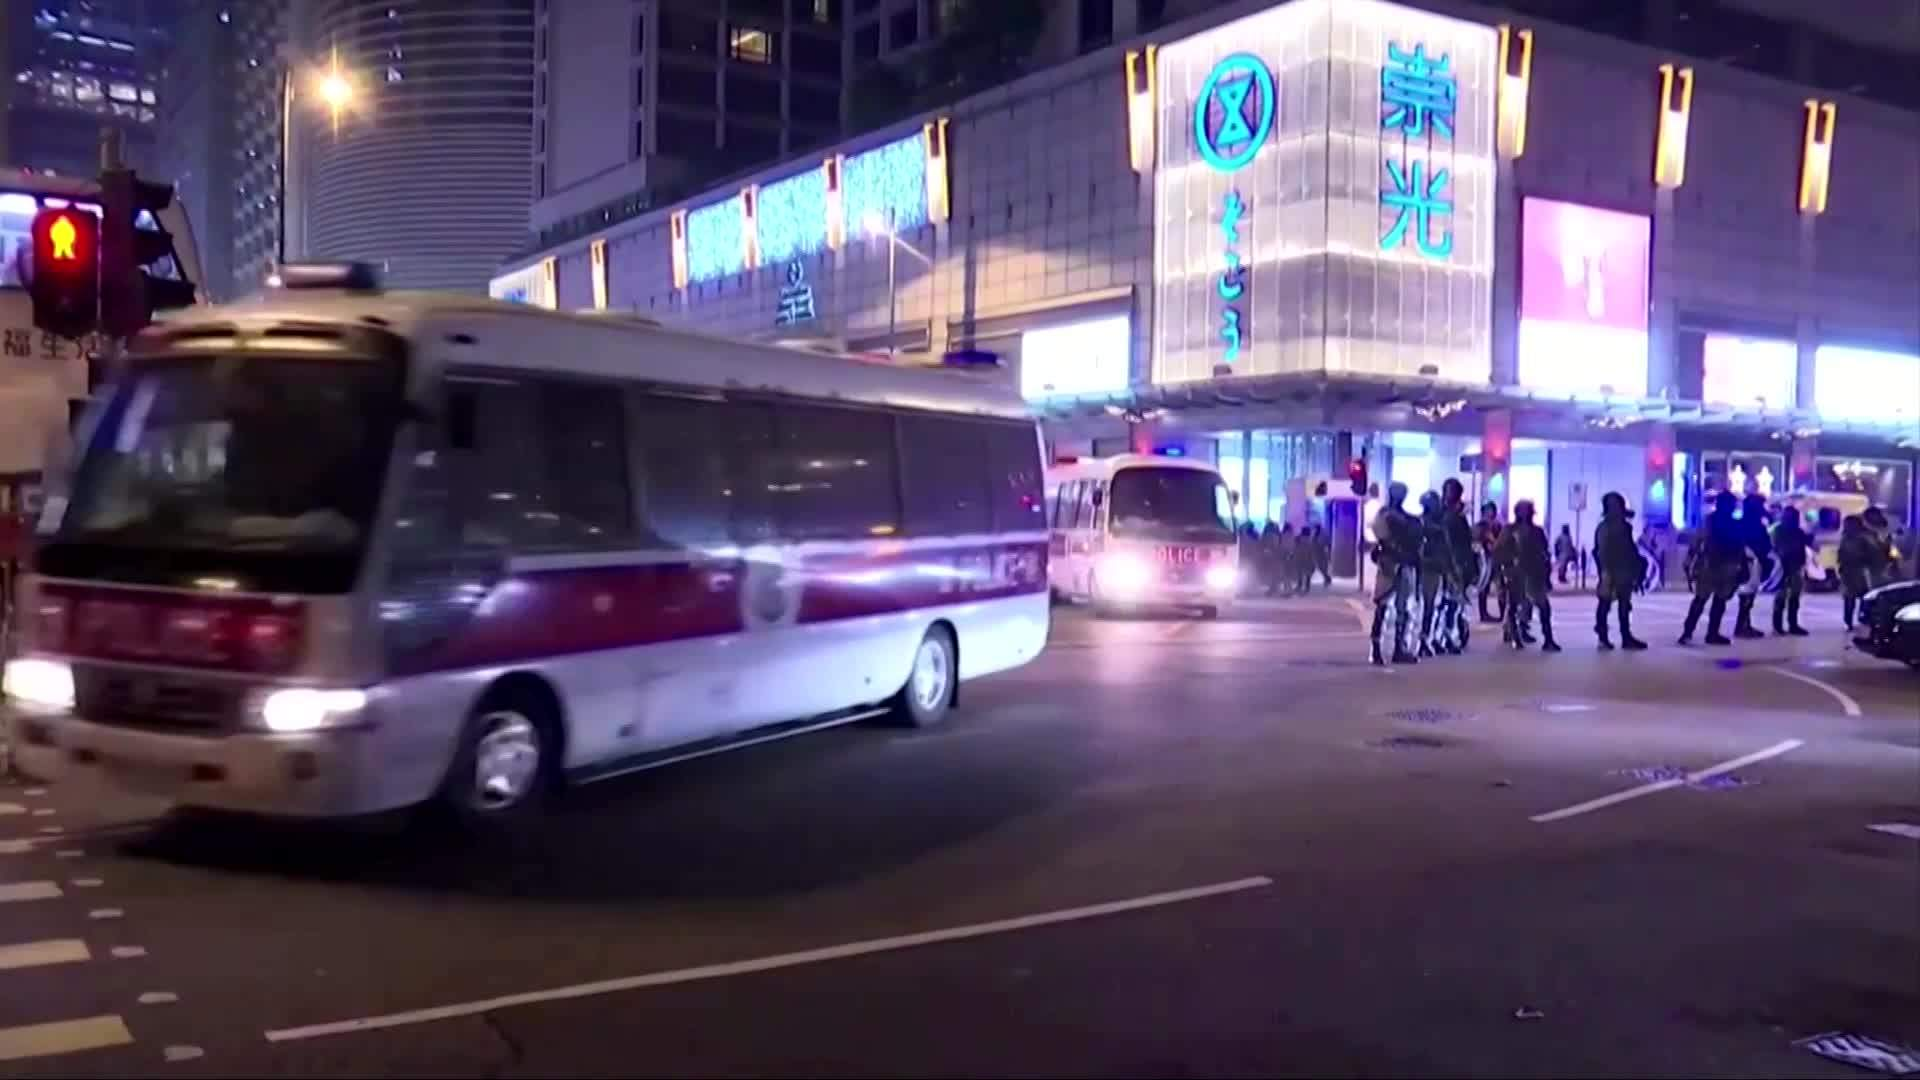 Hong Kong police fire tear gas on Christmas Eve